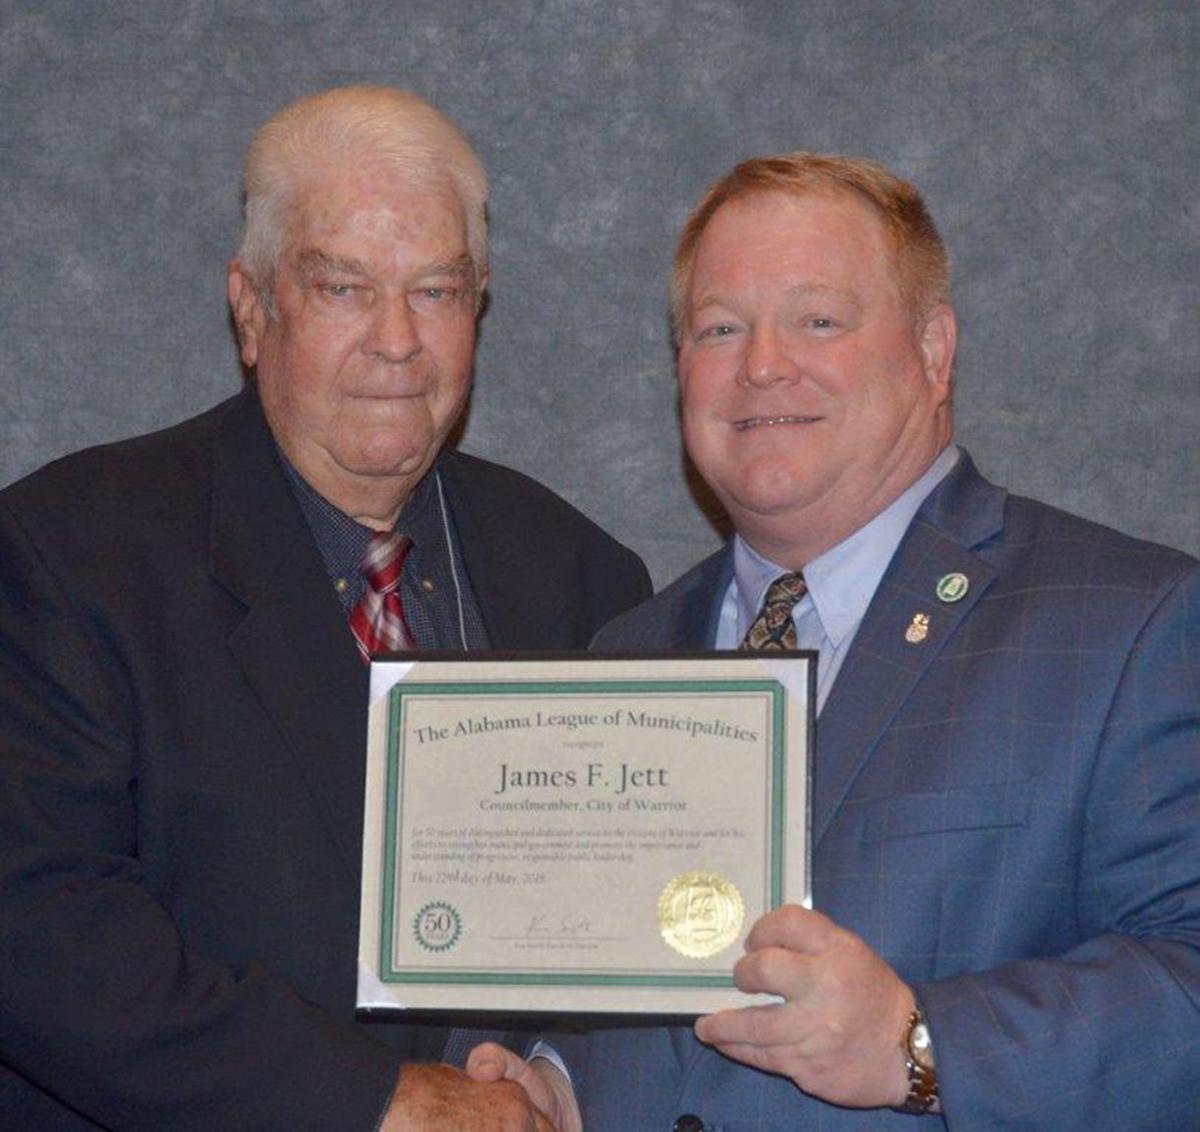 Jett honored for 50 years